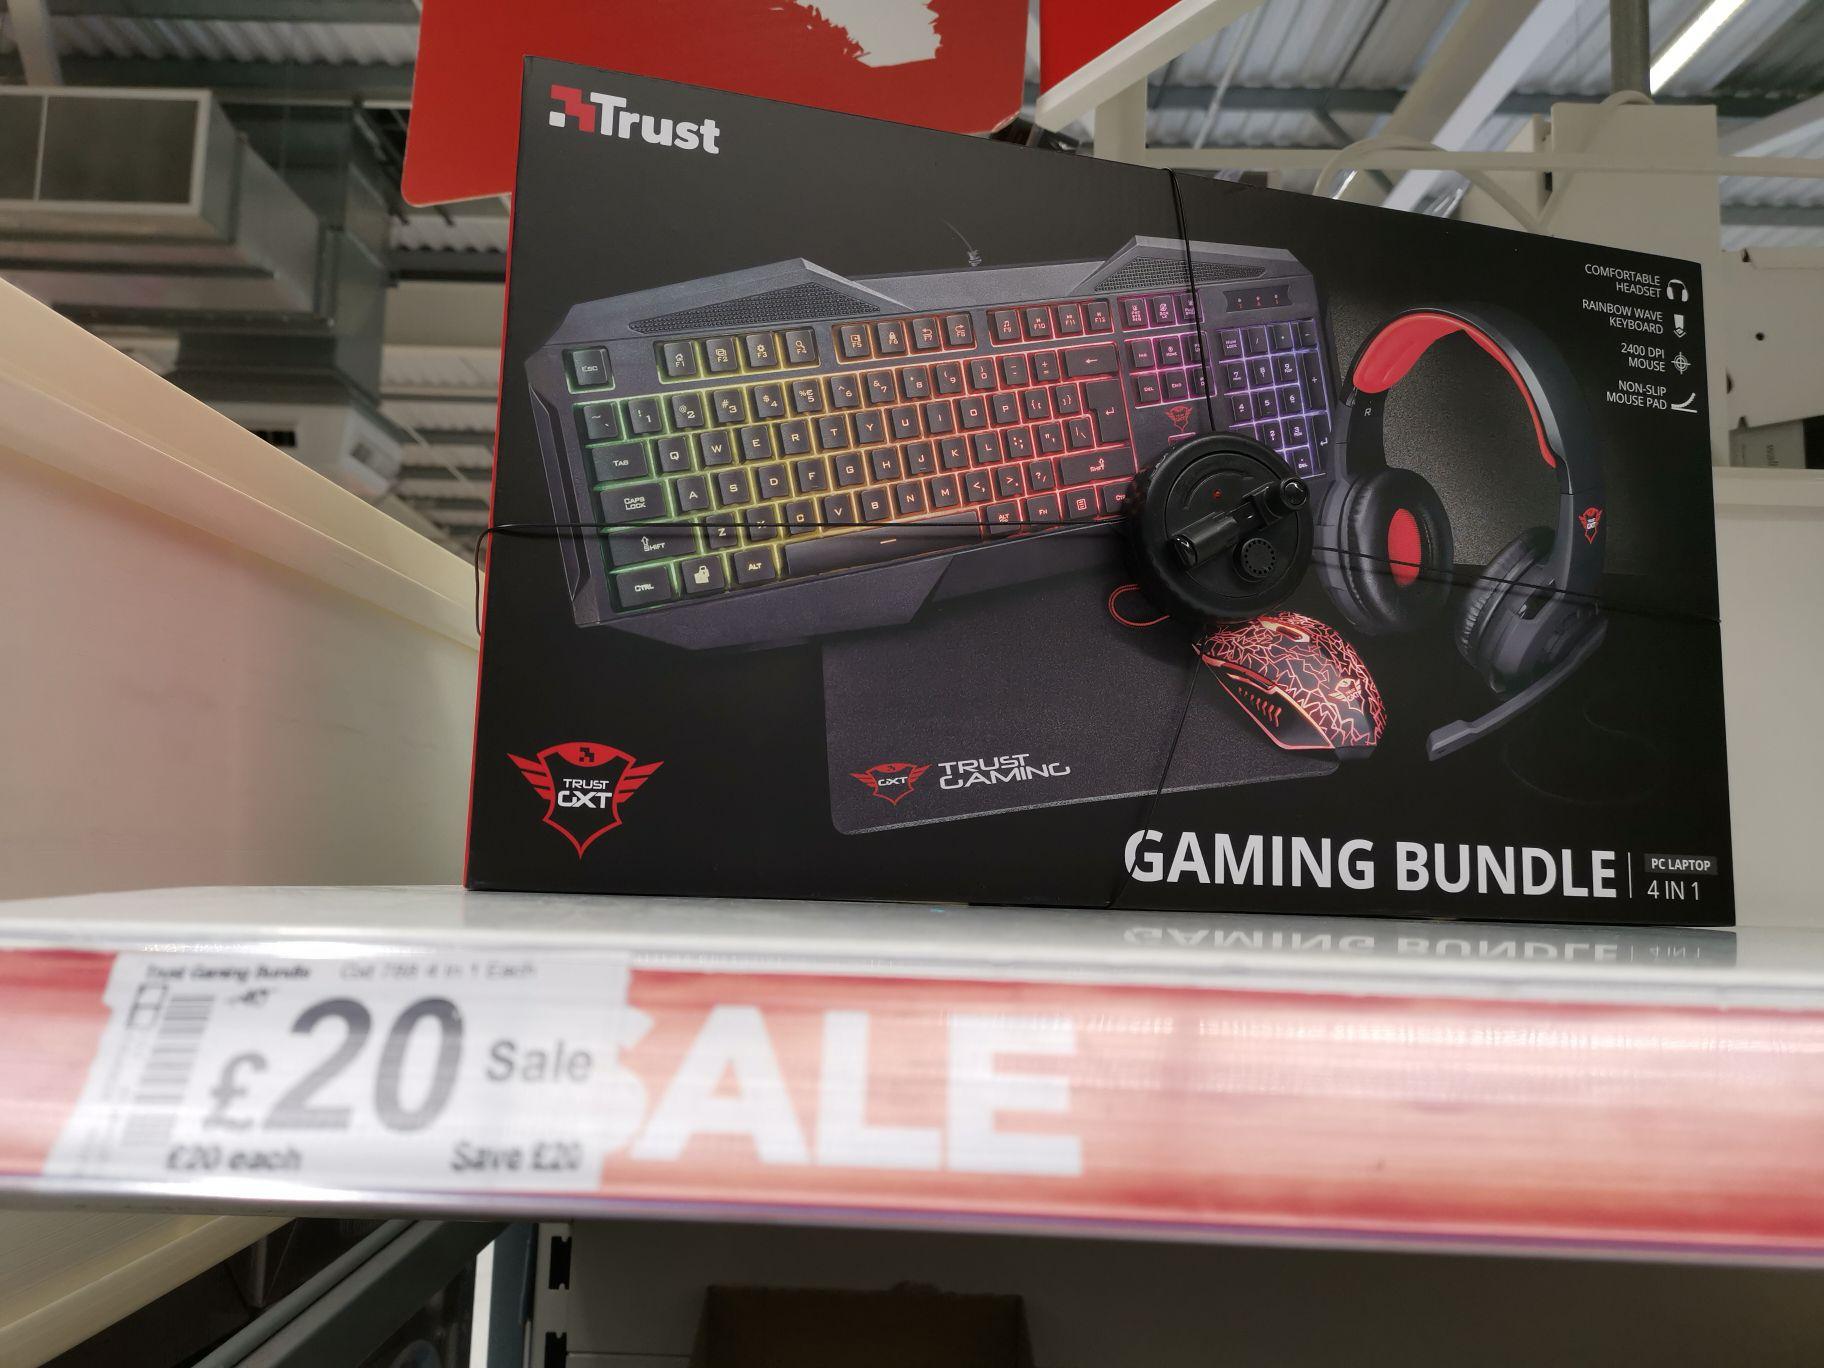 Trust 4 in 1 Gaming Bundle Asda In-store - £20